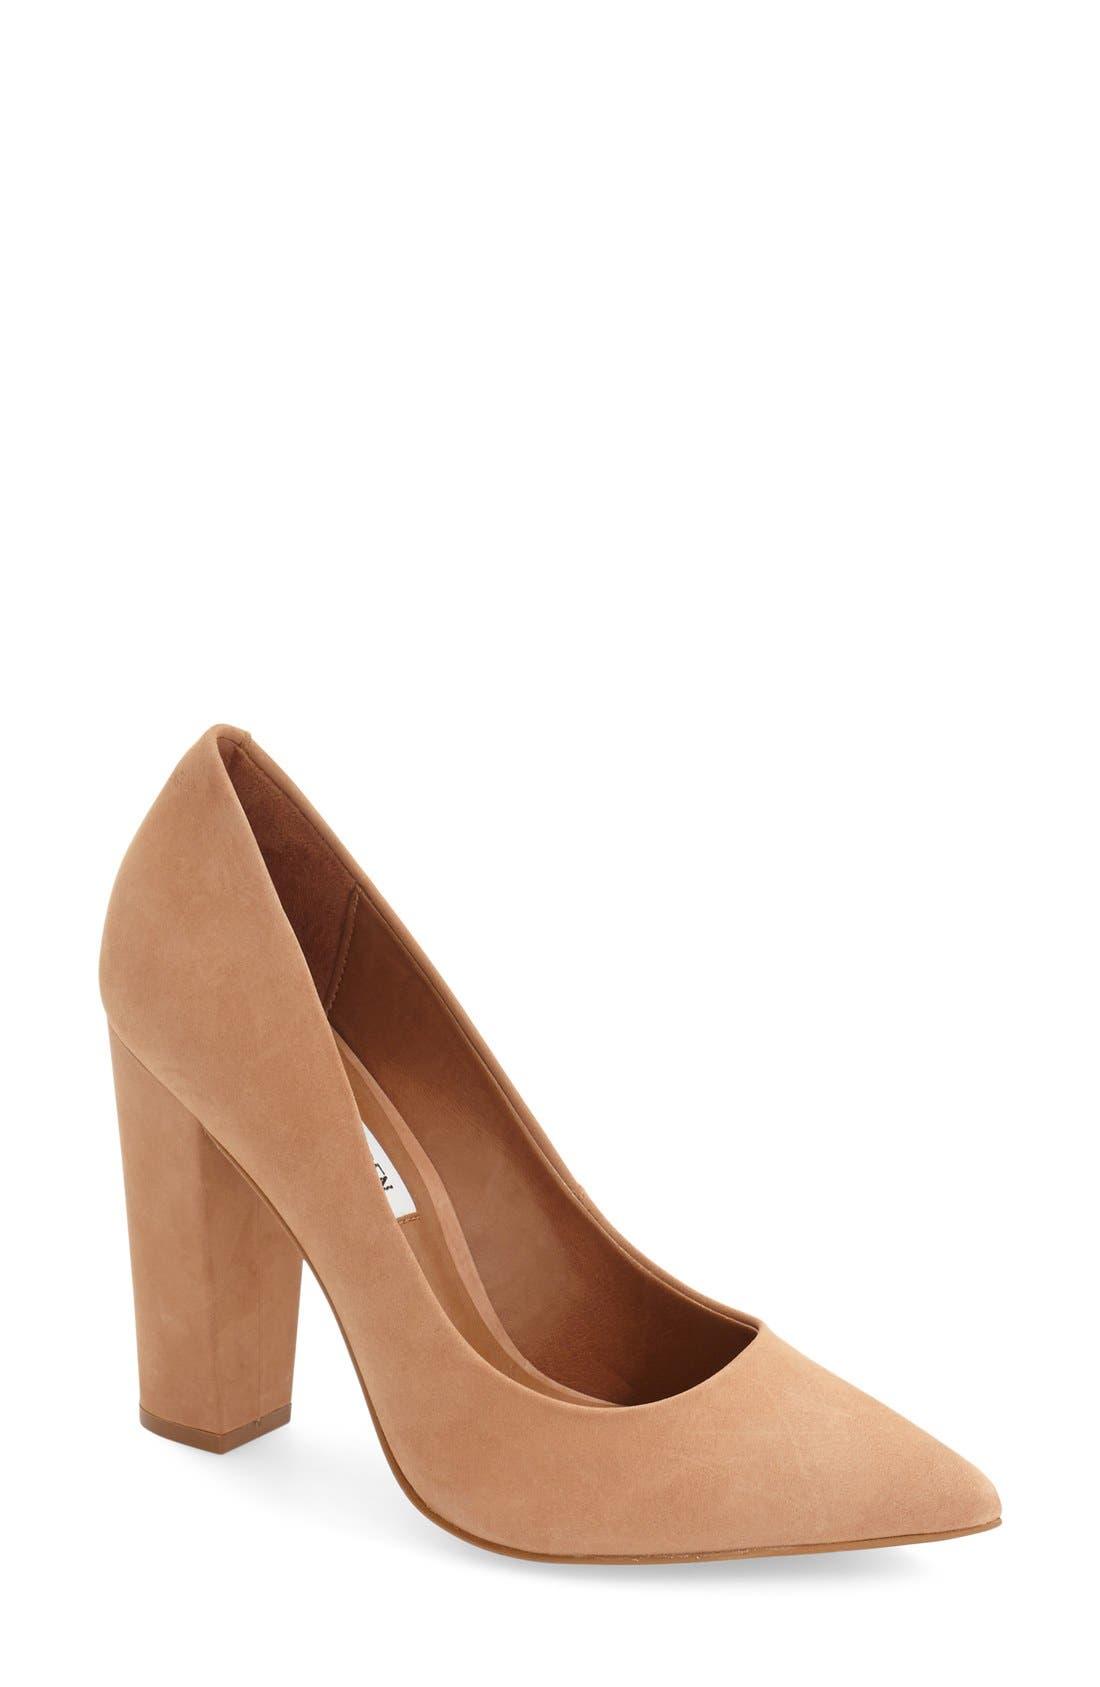 Alternate Image 1 Selected - Steve Madden 'Primpy' Pointy Toe Block Heel Pump (Women)